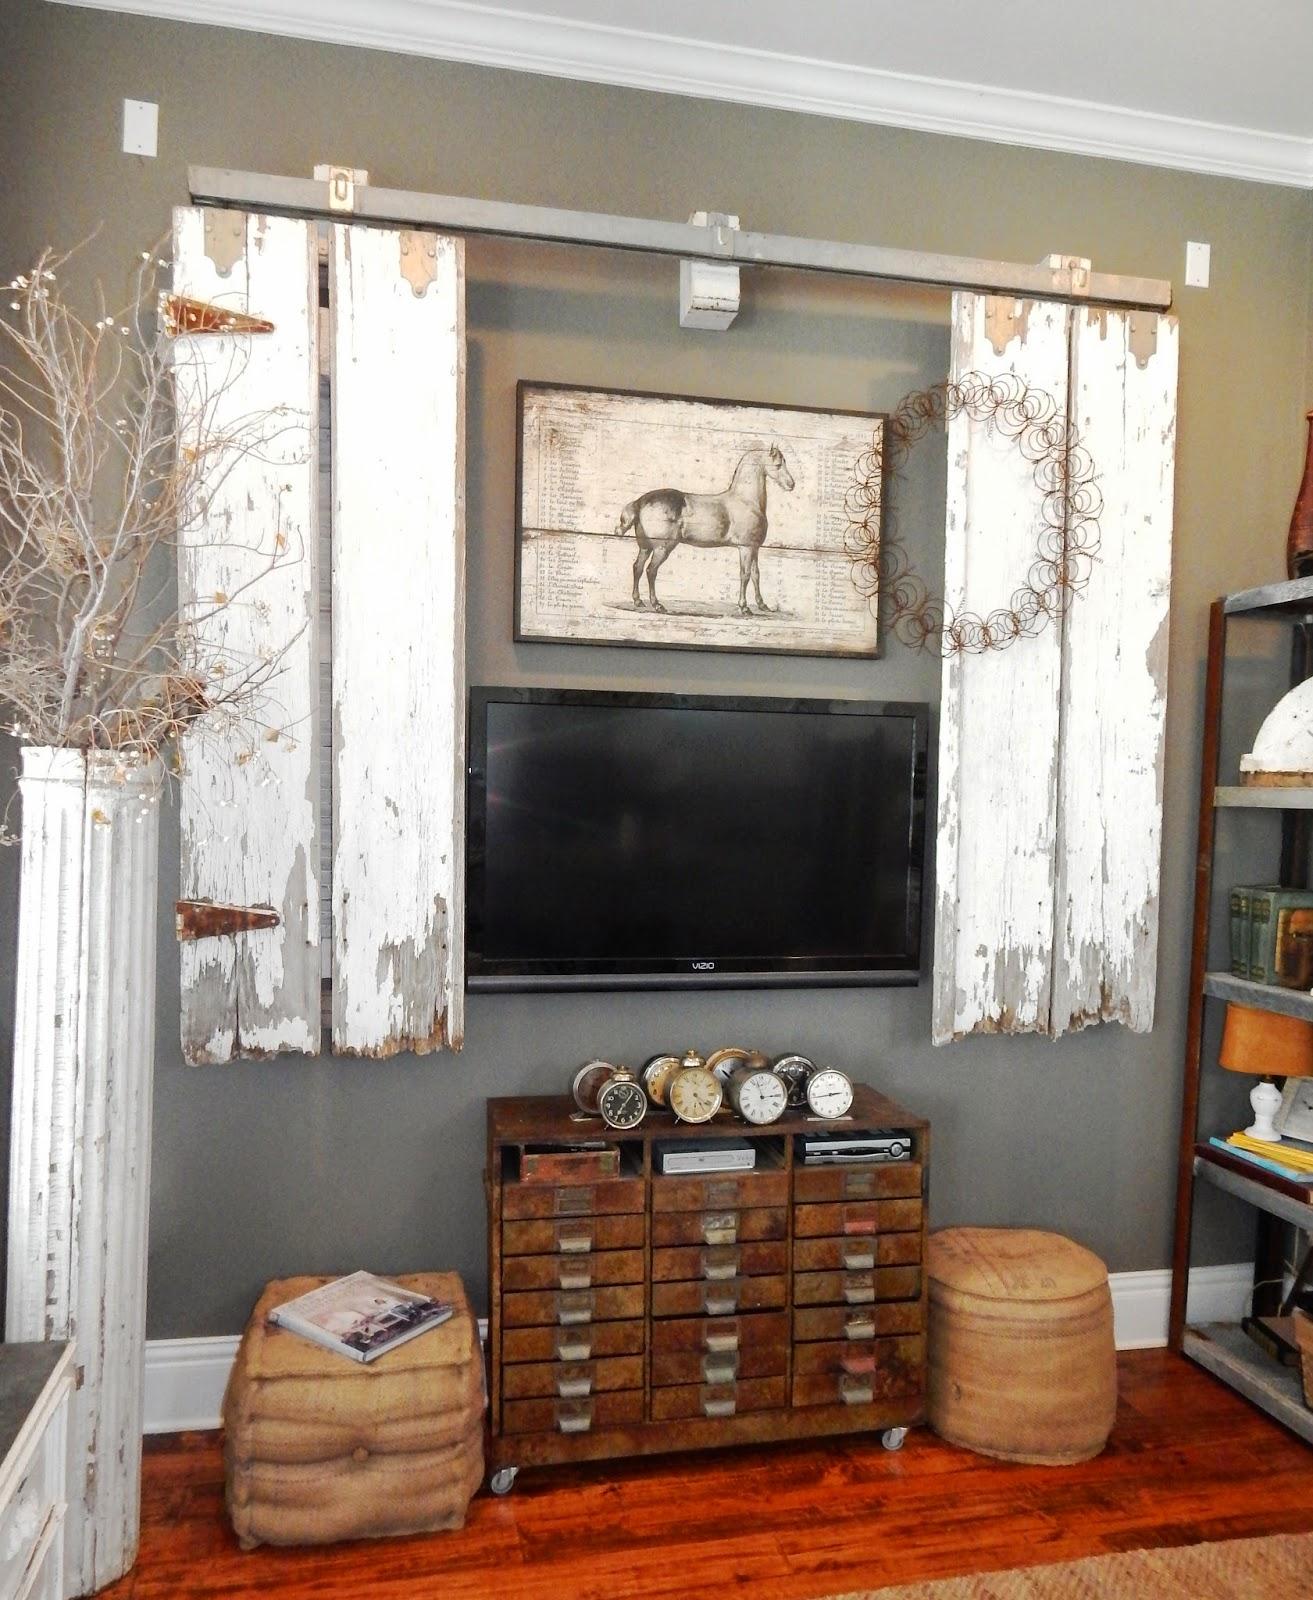 My Romantic Prairie Home: Barn Doors in the Den